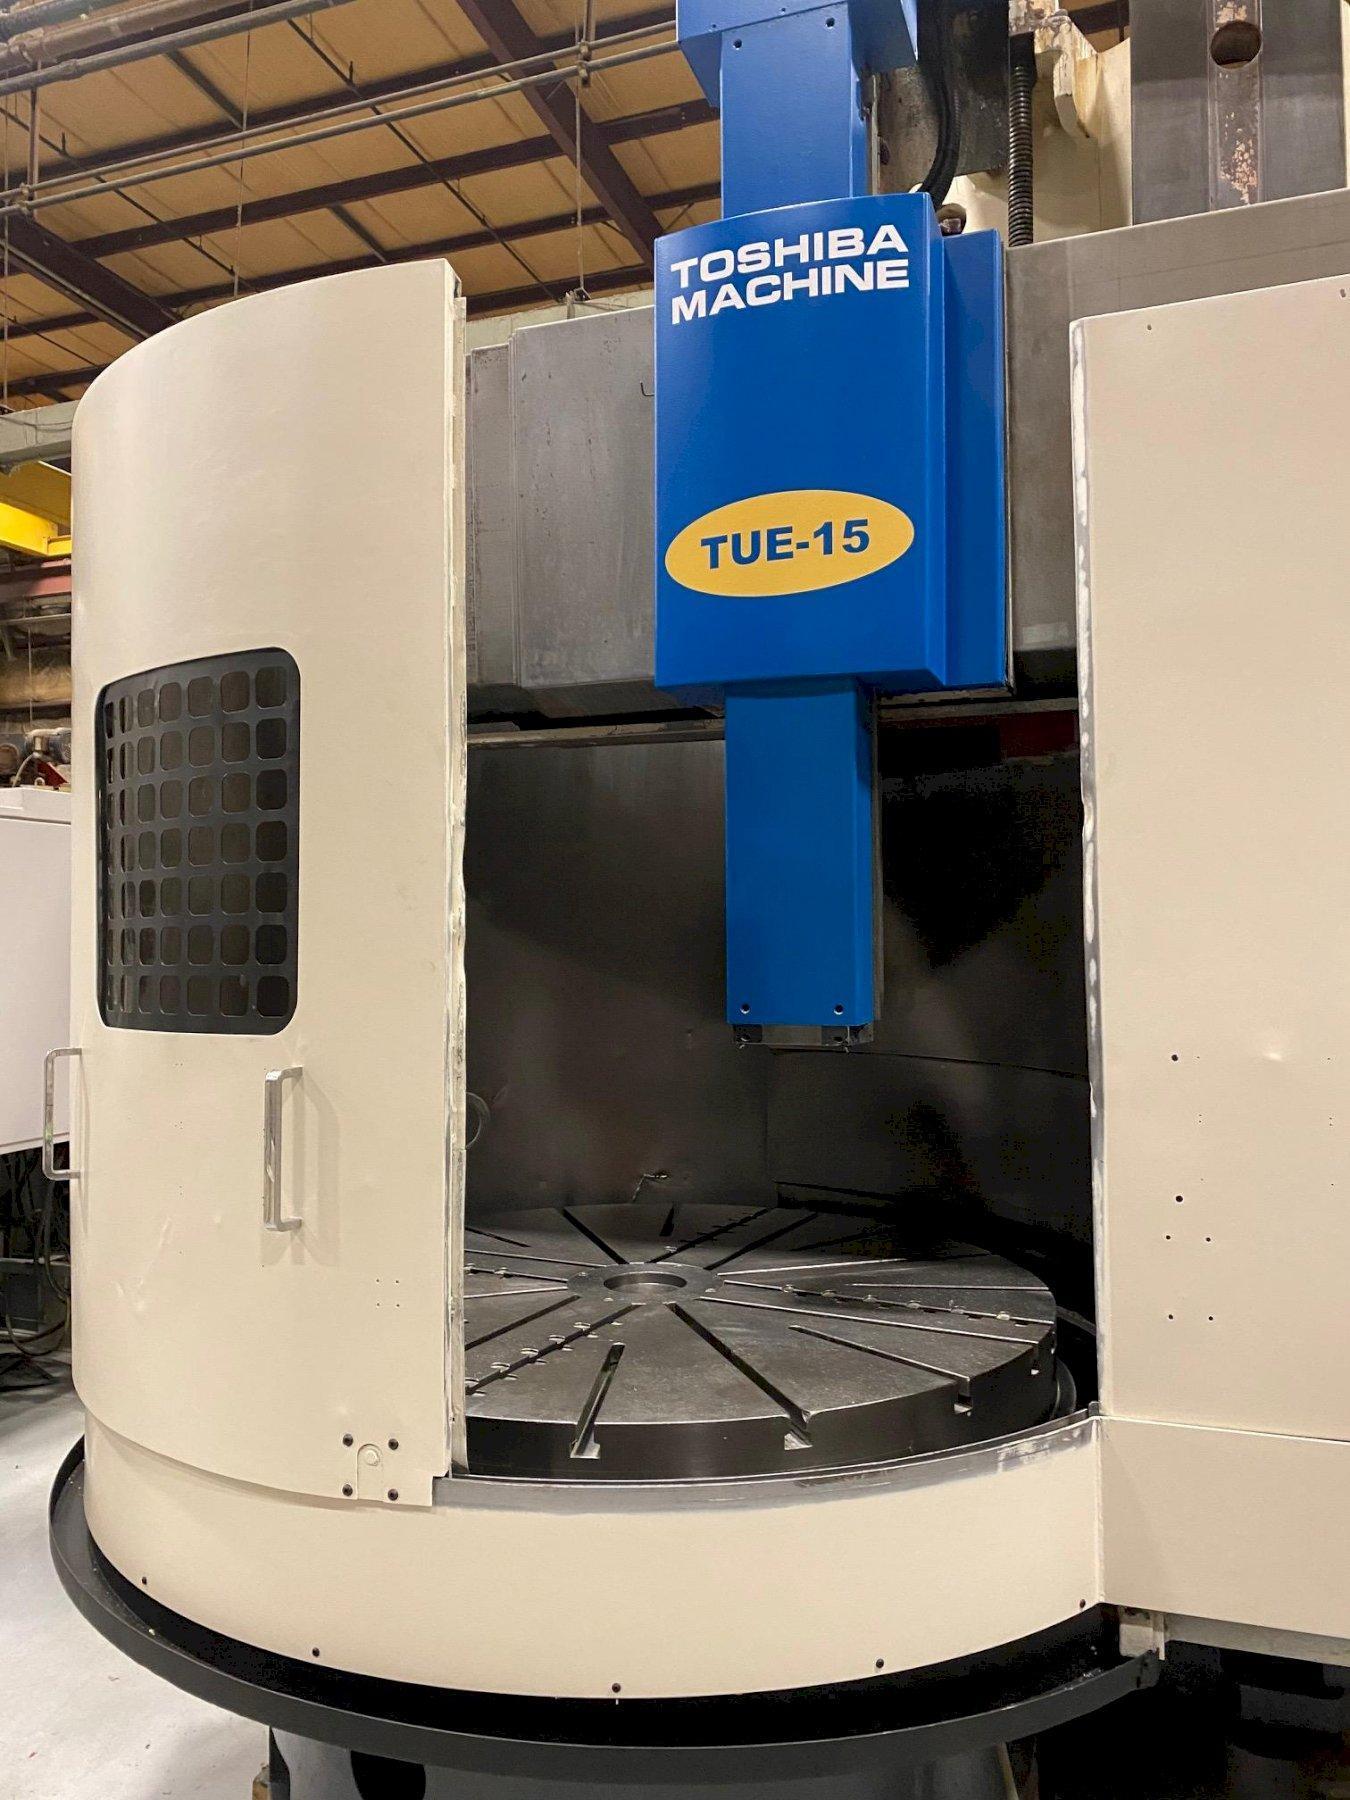 2006 Toshiba TUE-15 CNC Vertical Boring Mill